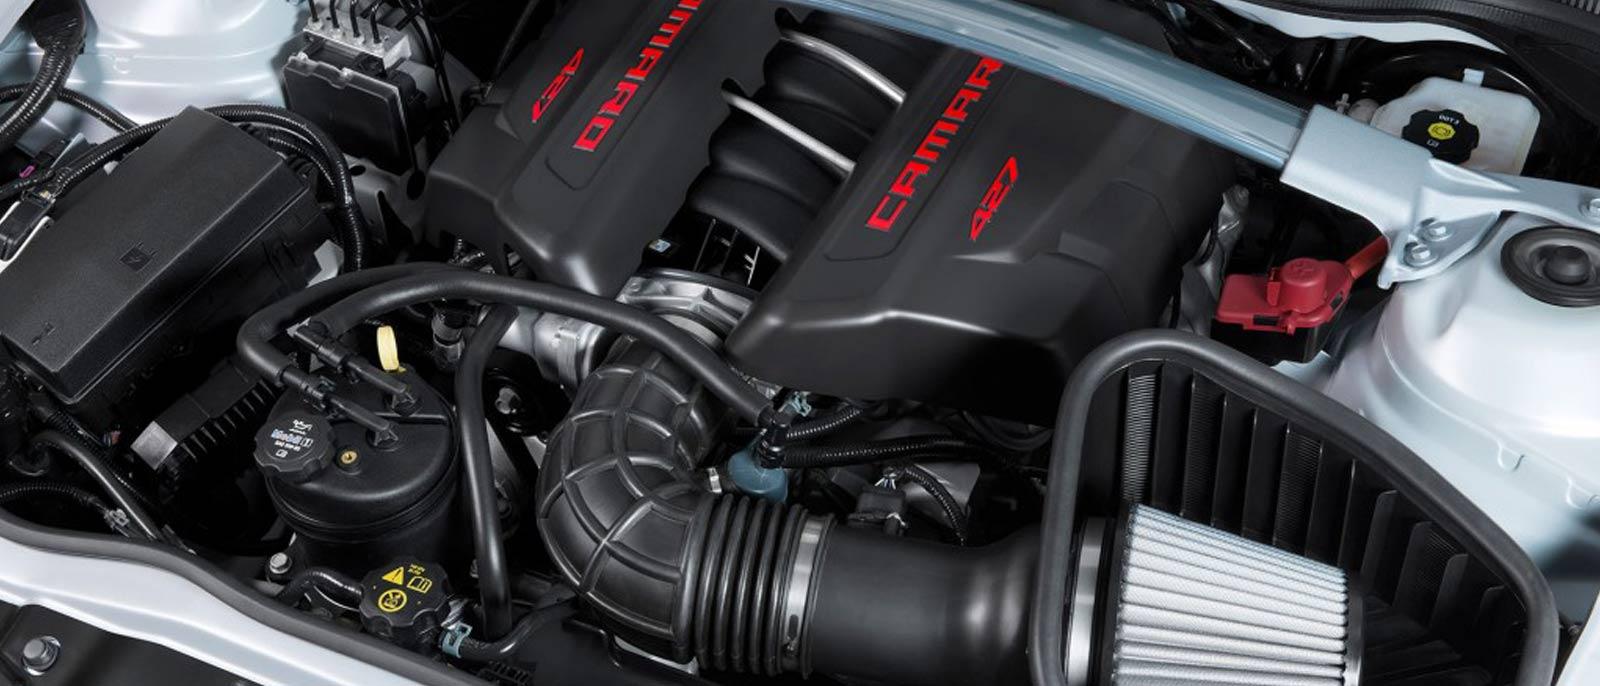 2015 Chevy Camaro Z/28 Engine